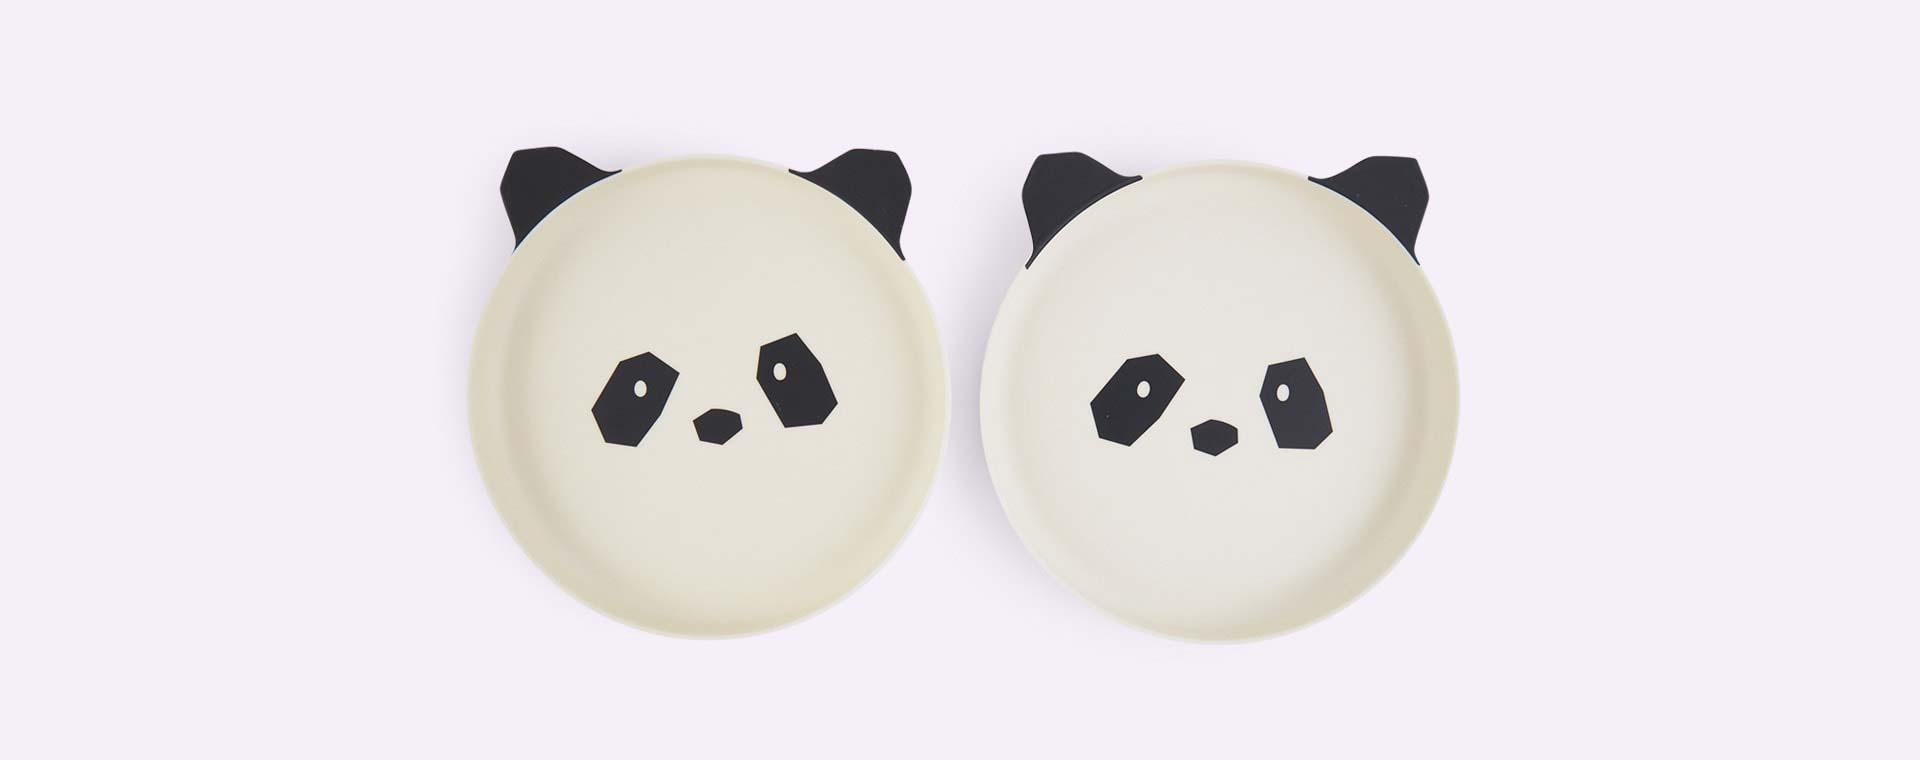 Panda Liewood Bamboo Plates - 2 Pack